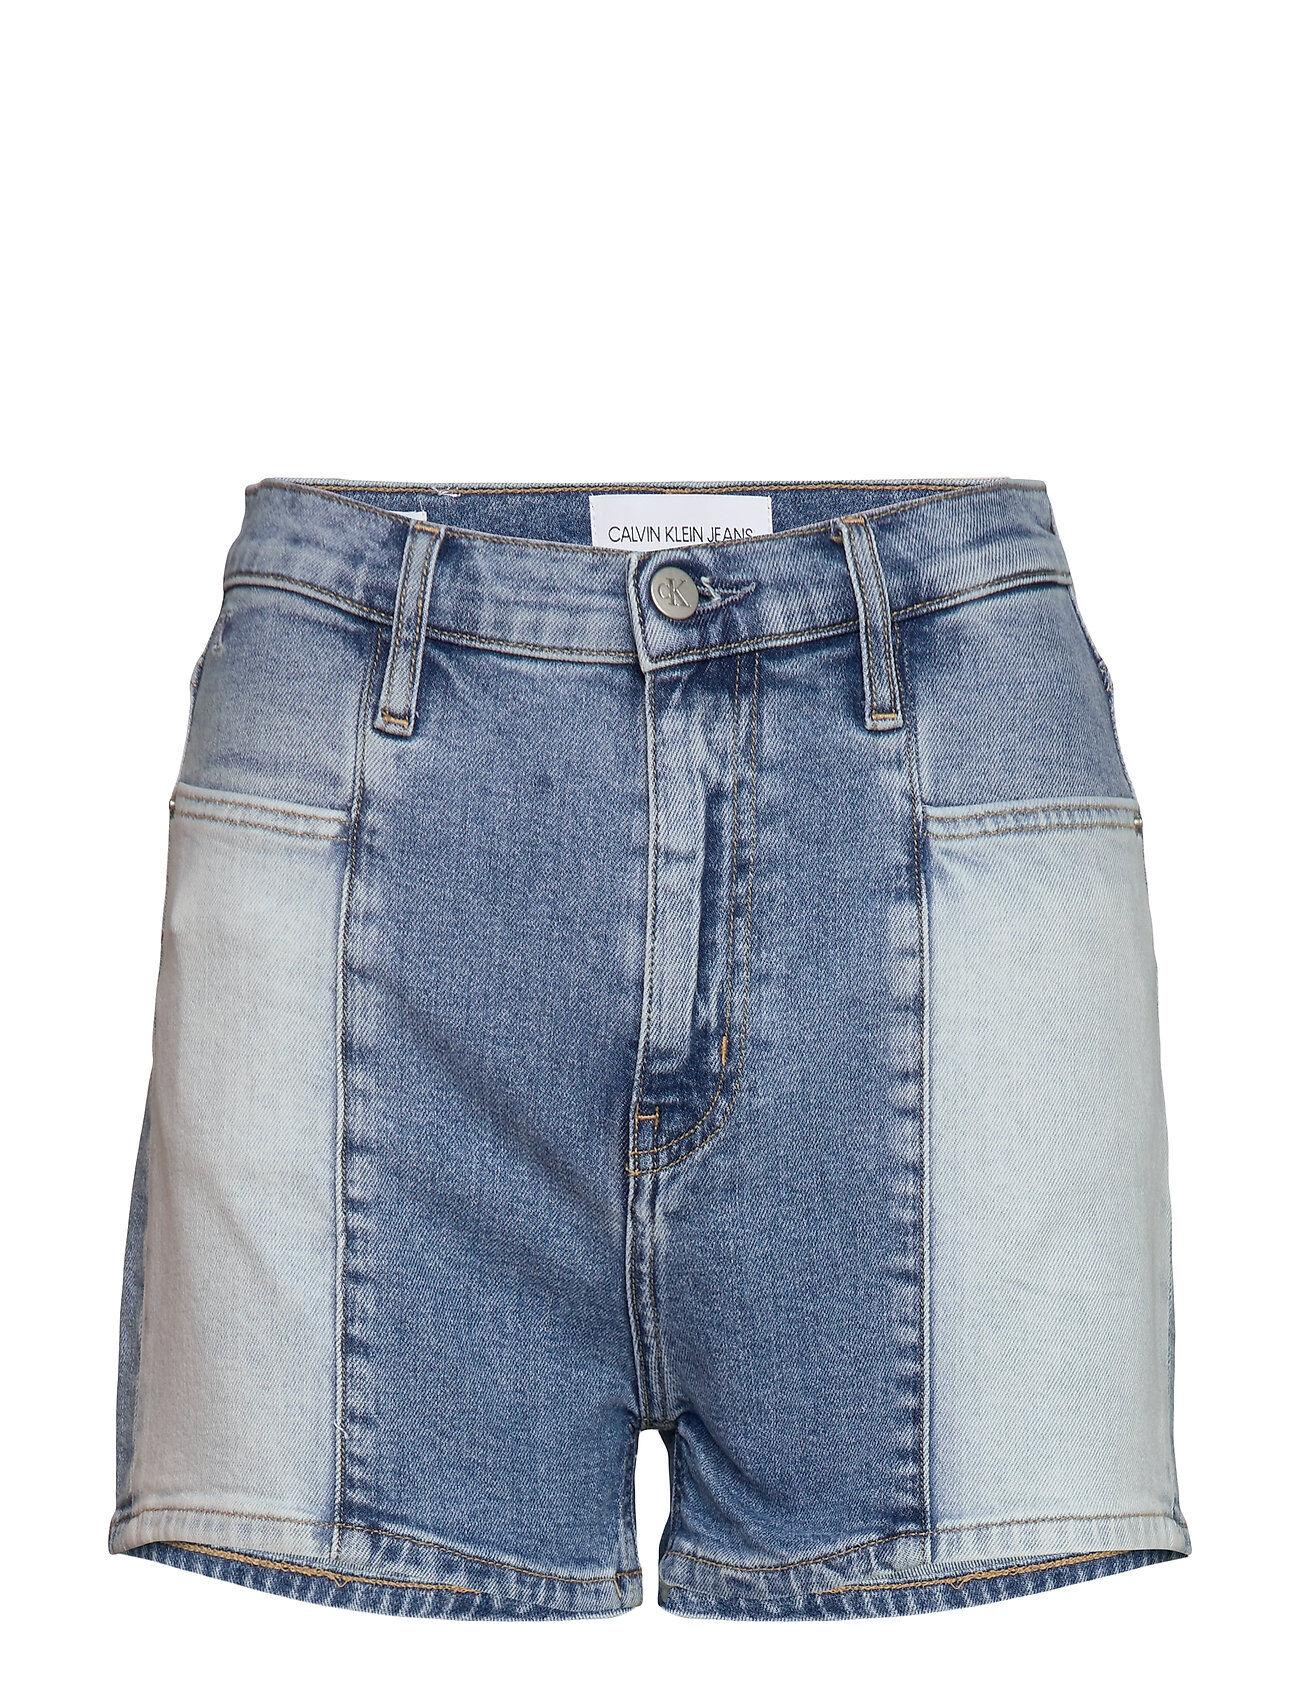 Image of Calvin High Rise Short Shorts Denim Shorts Sininen Calvin Klein Jeans